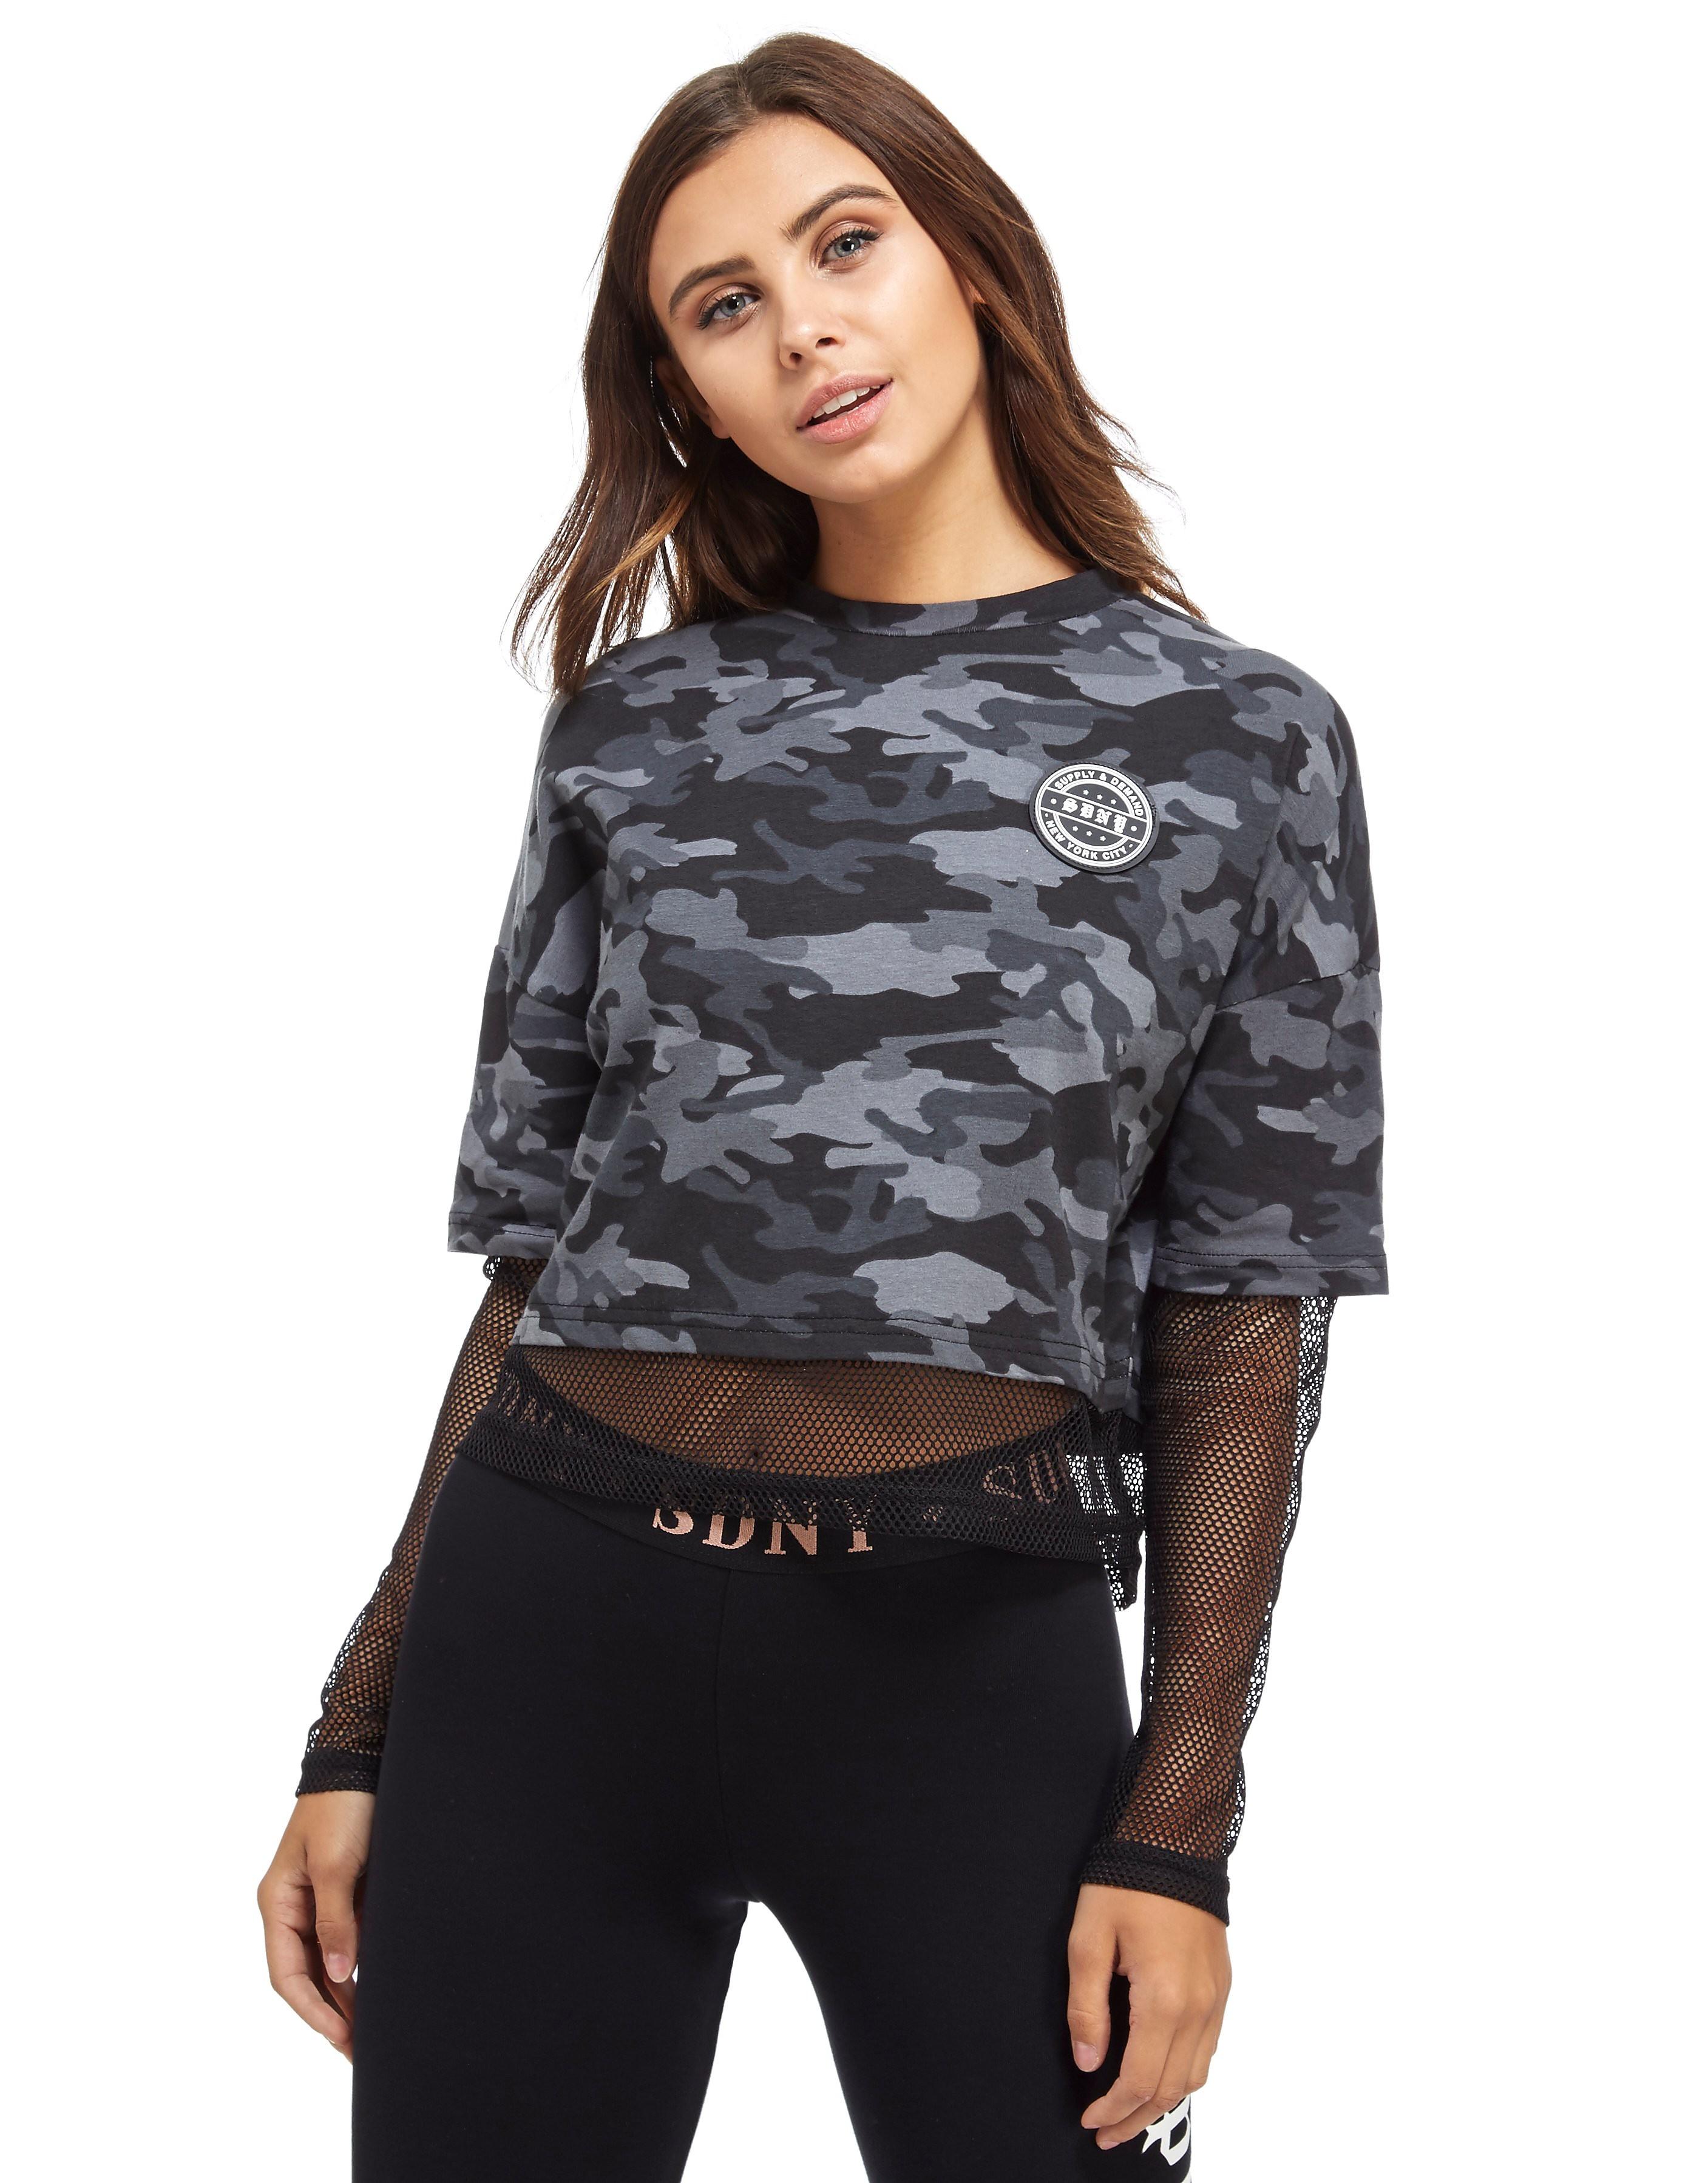 Supply & Demand Fishnet Camo T-Shirt